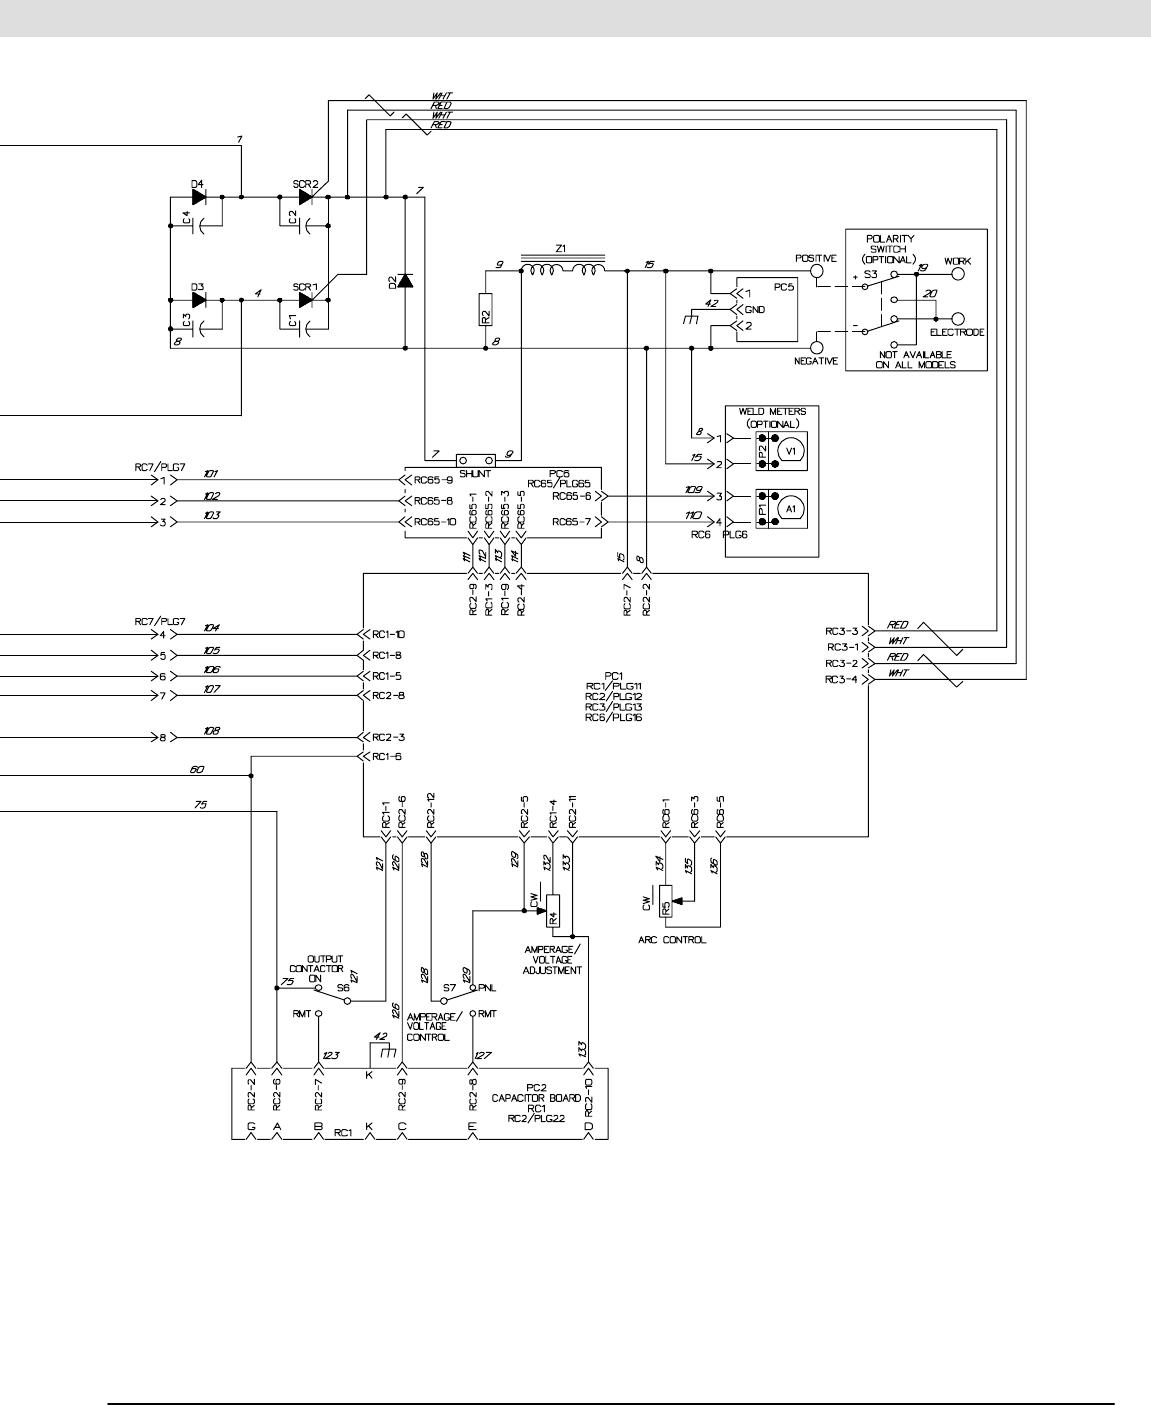 8 1 circuit diagram for welding generator 35om 402